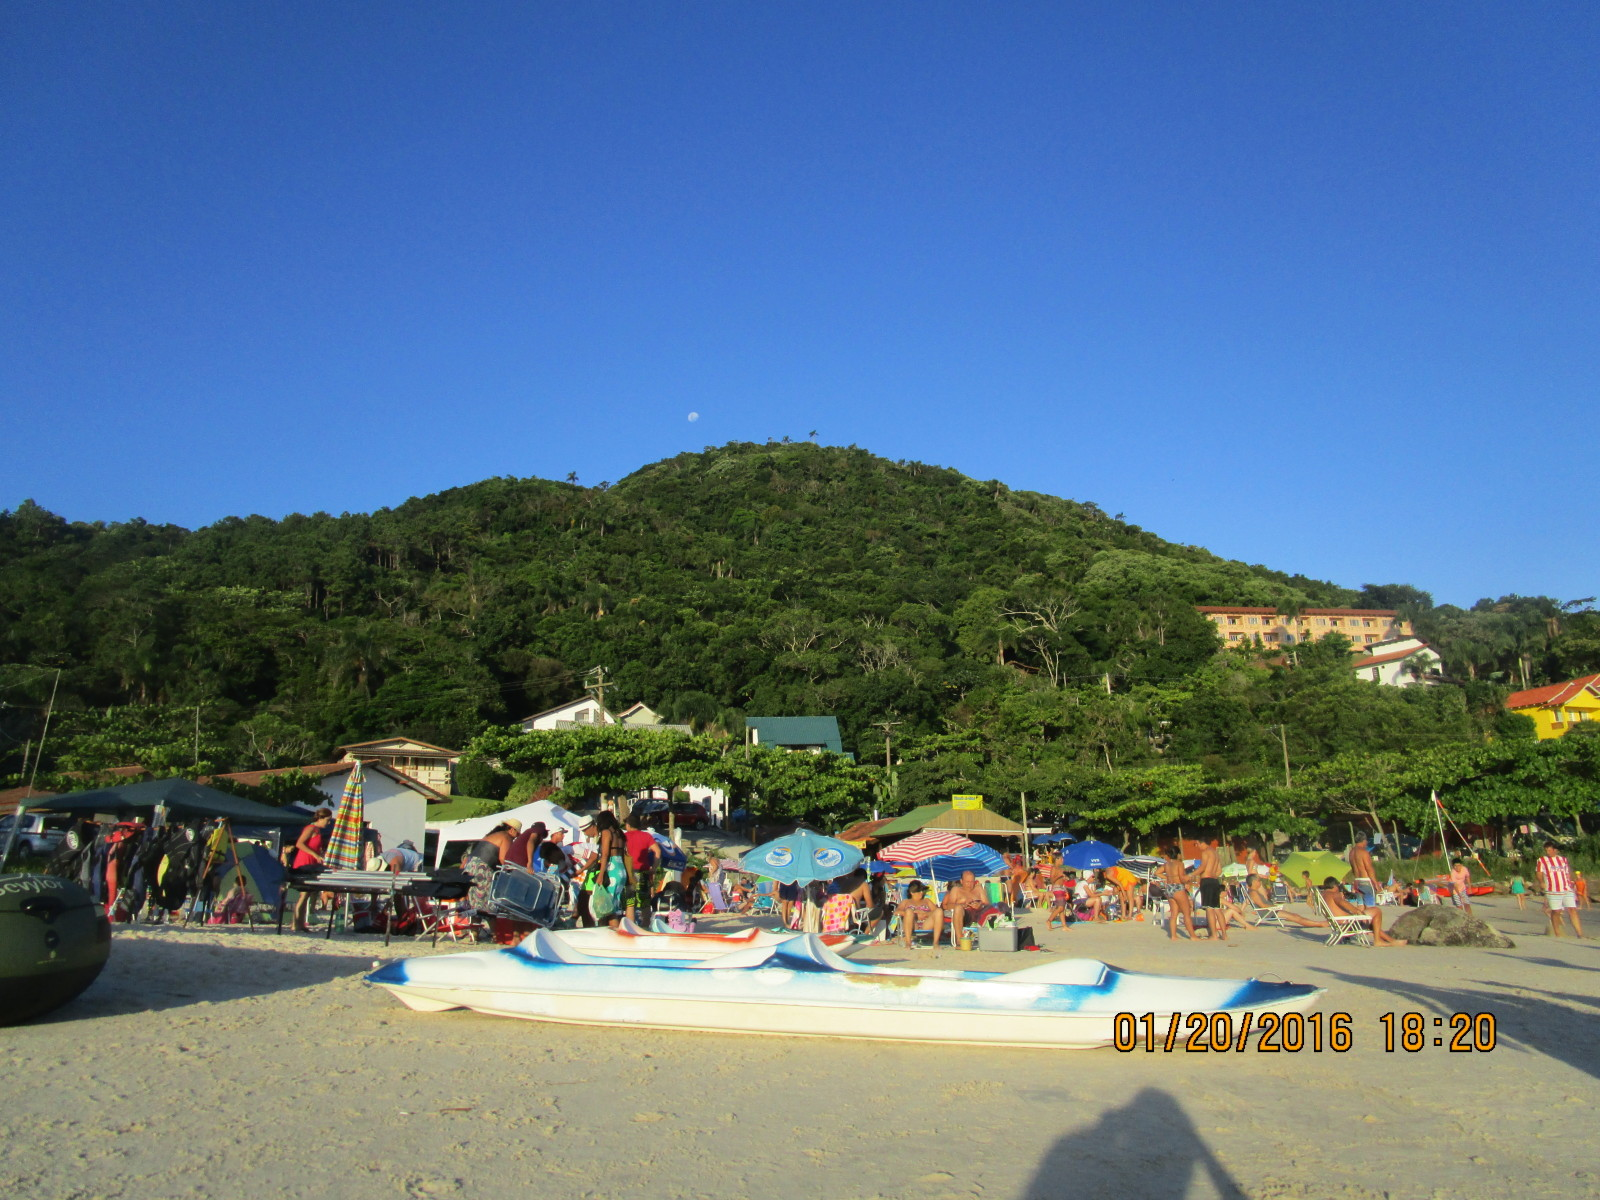 Informe Camping en Brasil - Camping 4 Ilhas - Bombas y Bombinhas 2d7t3dd